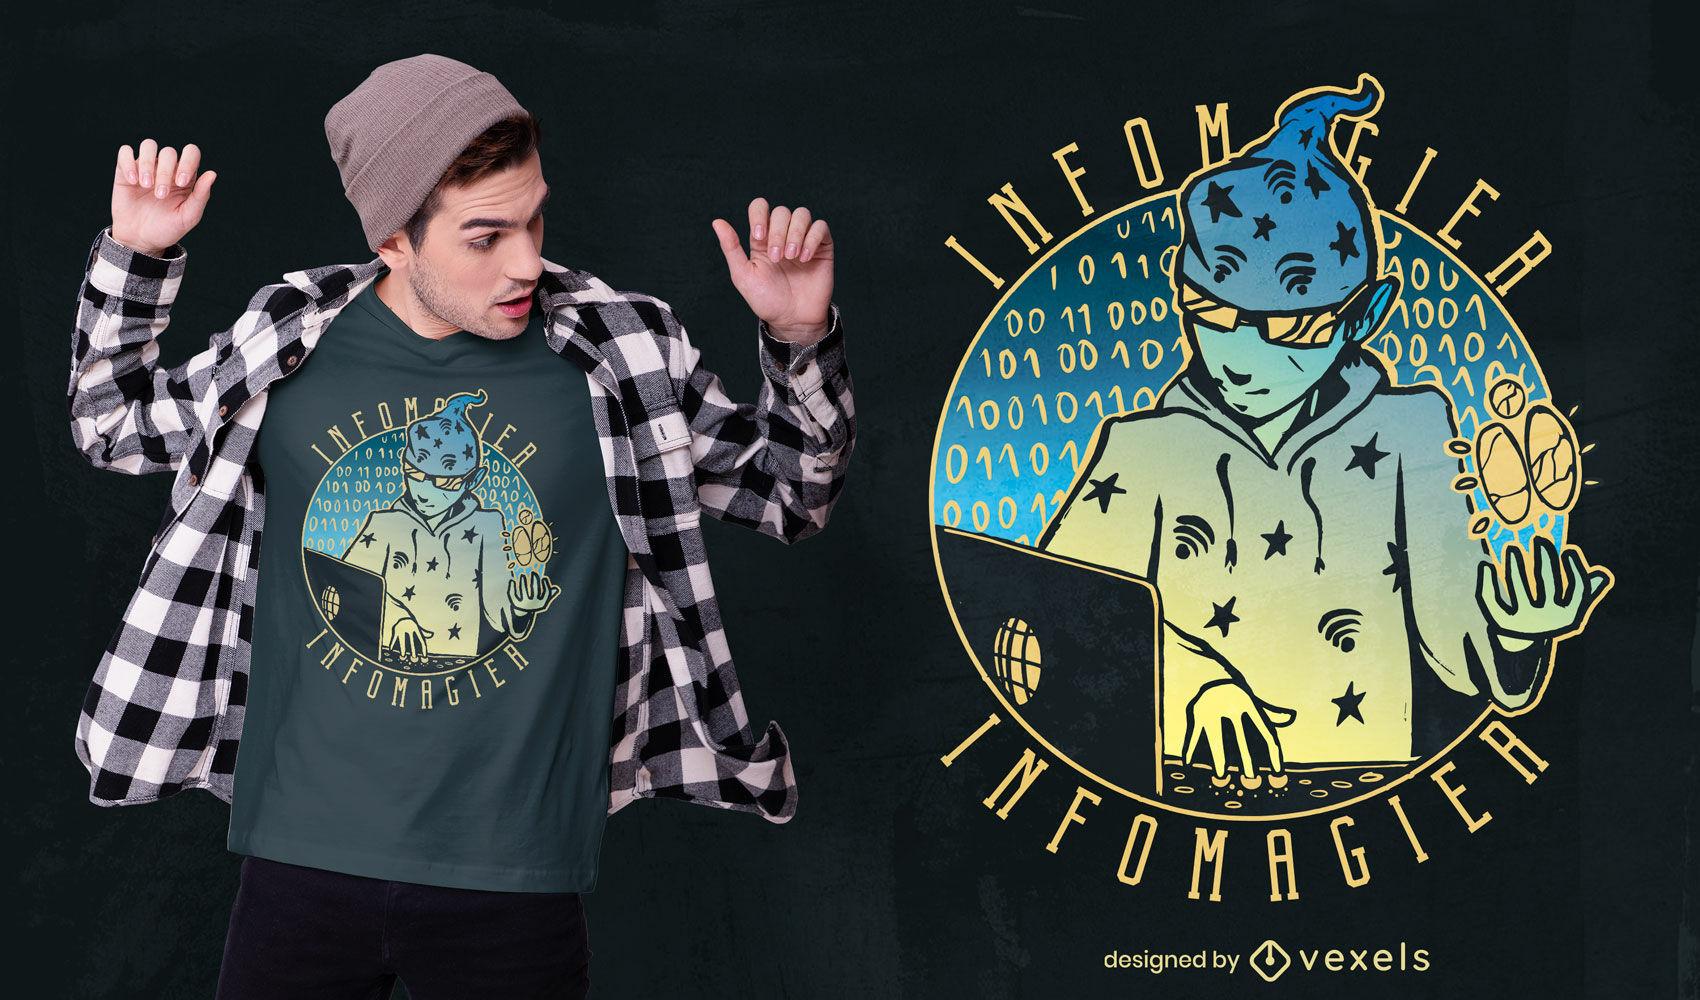 Diseño de camiseta infomagier alemán degradado hacker